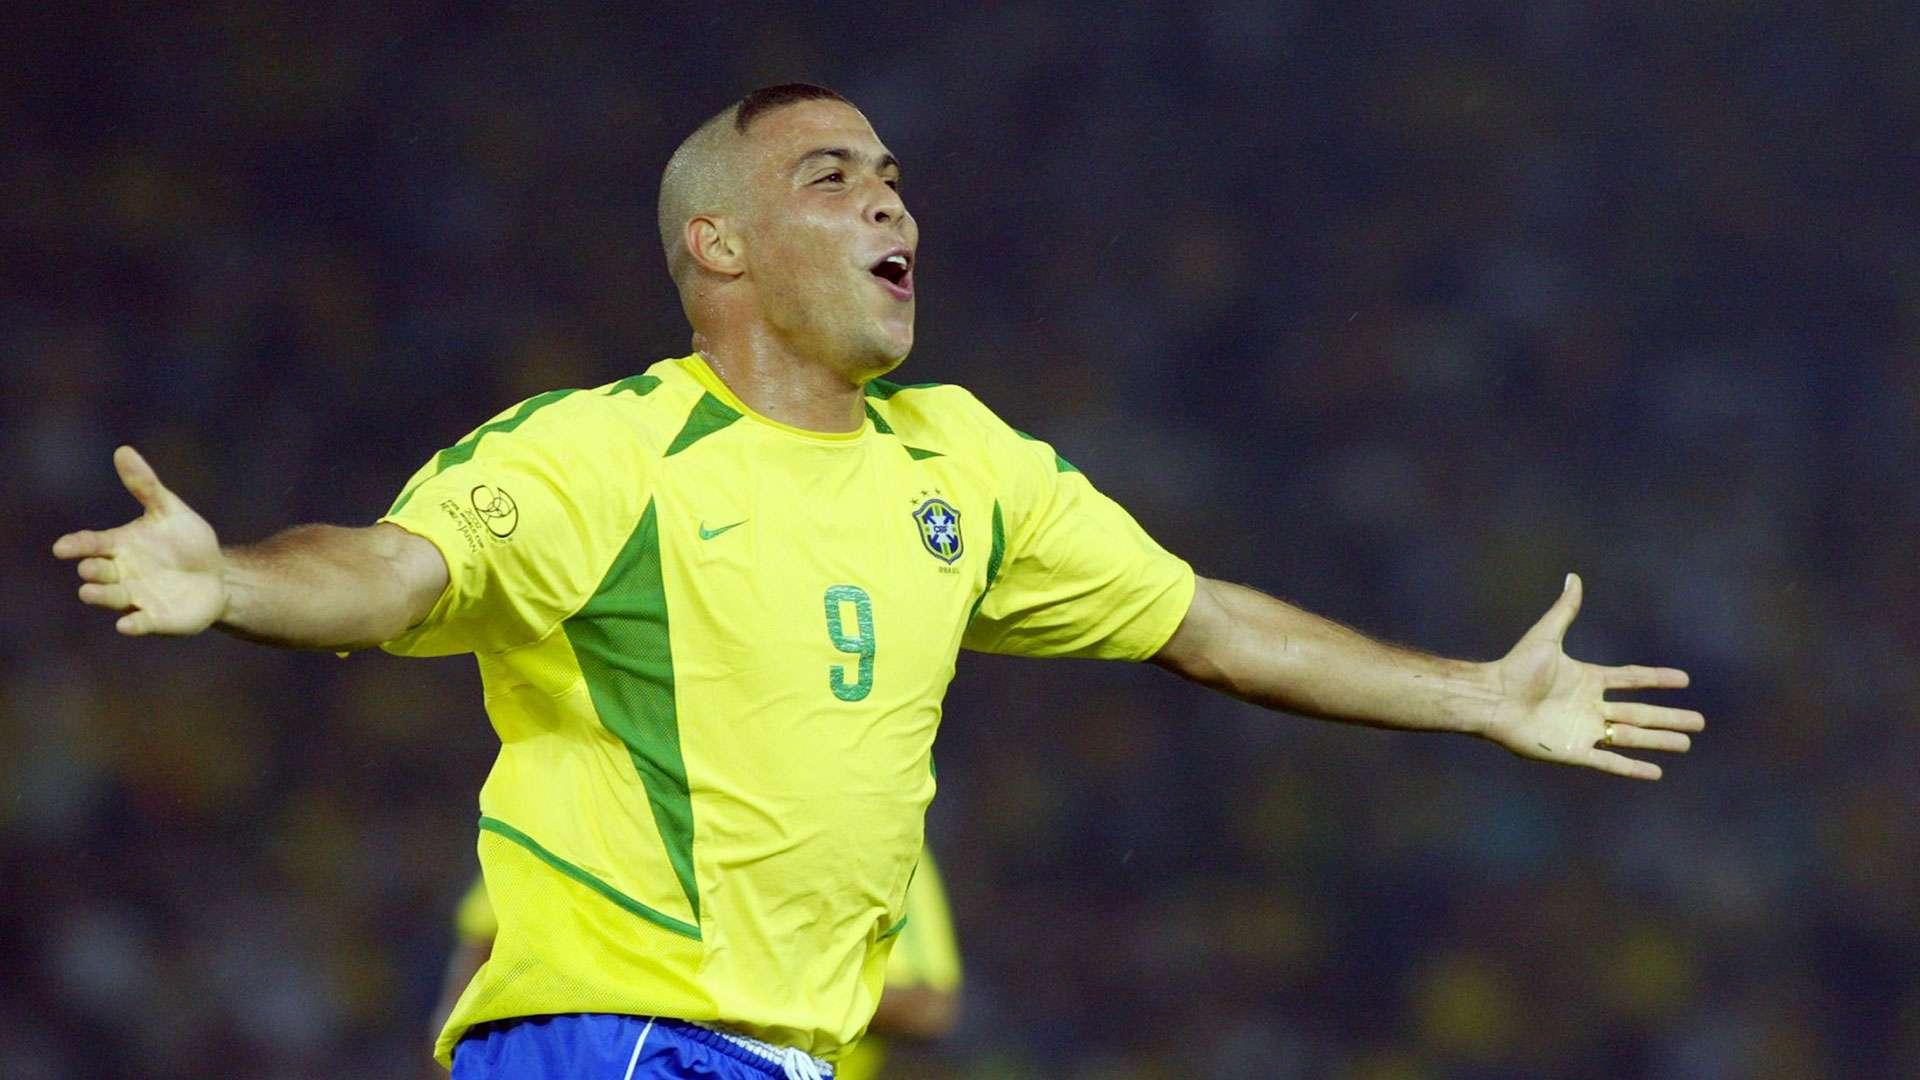 Ronaldo: Brazil legend reveals reason behind famous 2002 World Cup